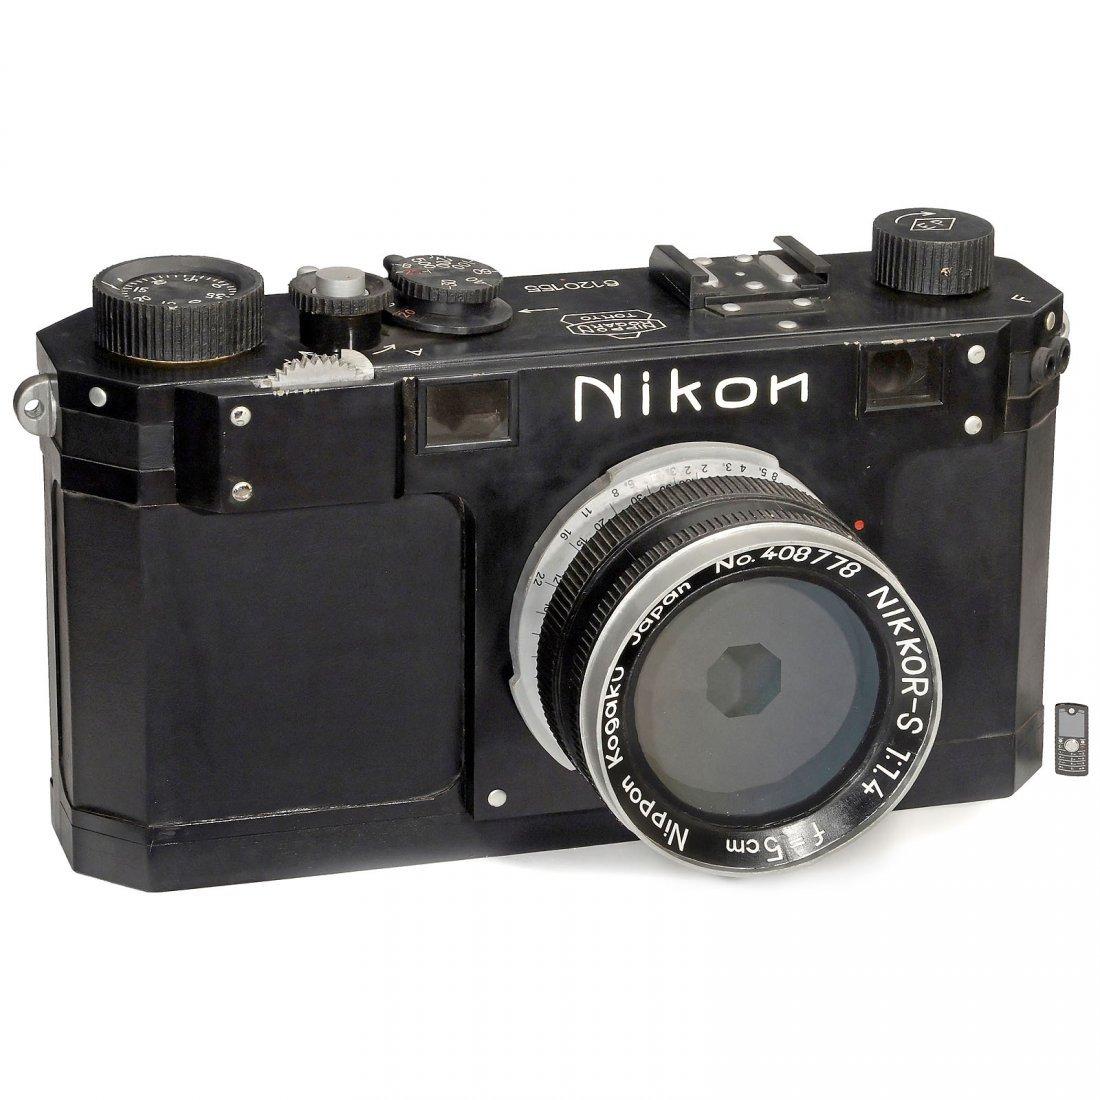 "Giant ""Nikon S"" Advertising Model, c. 1951"